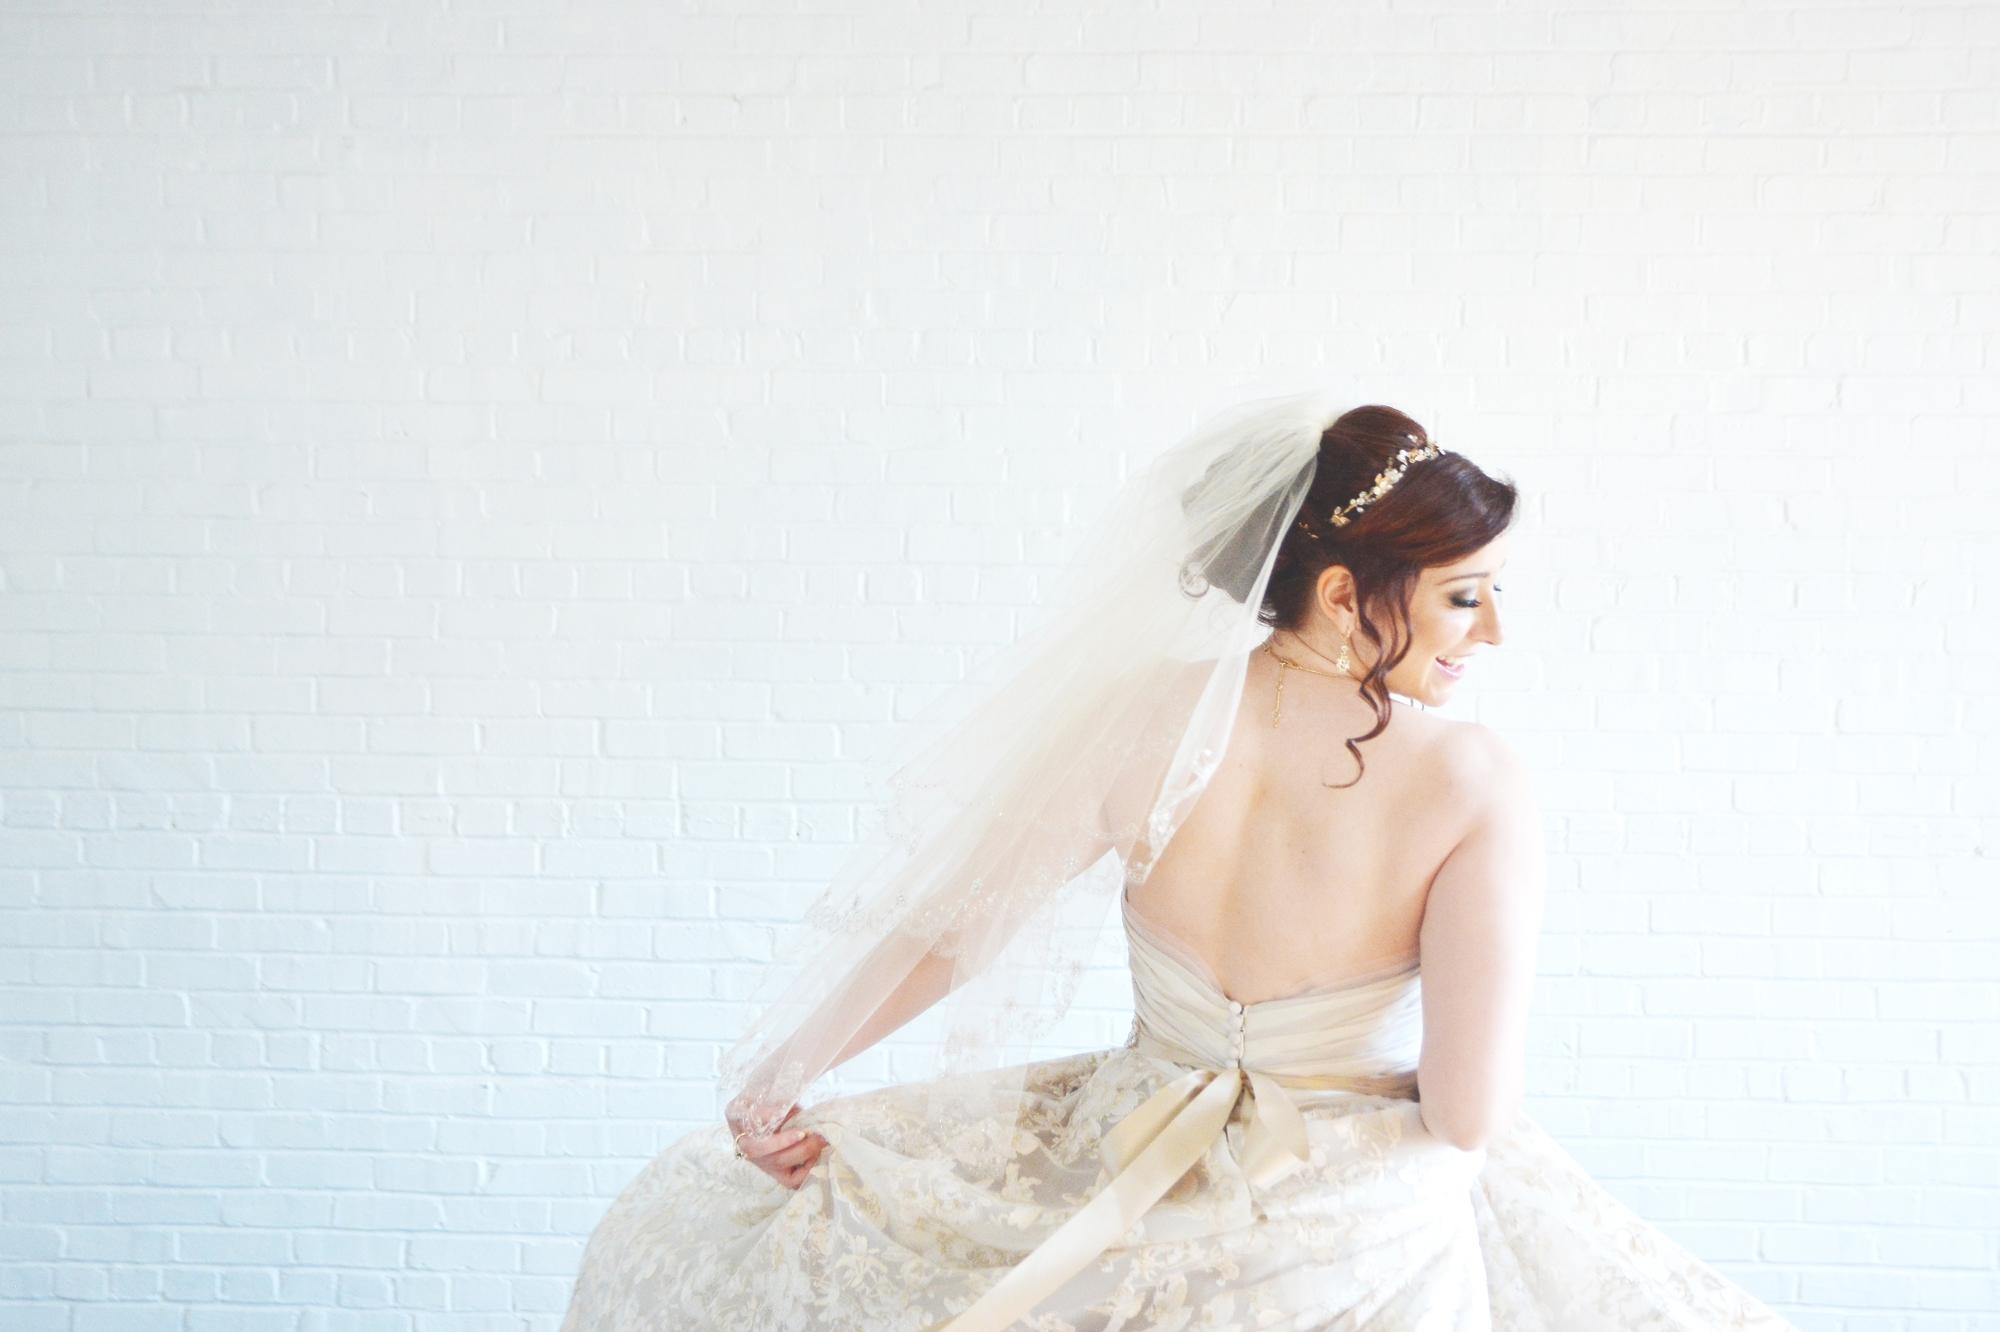 ambient-studio-wedding-photography-six-hearts-photography022